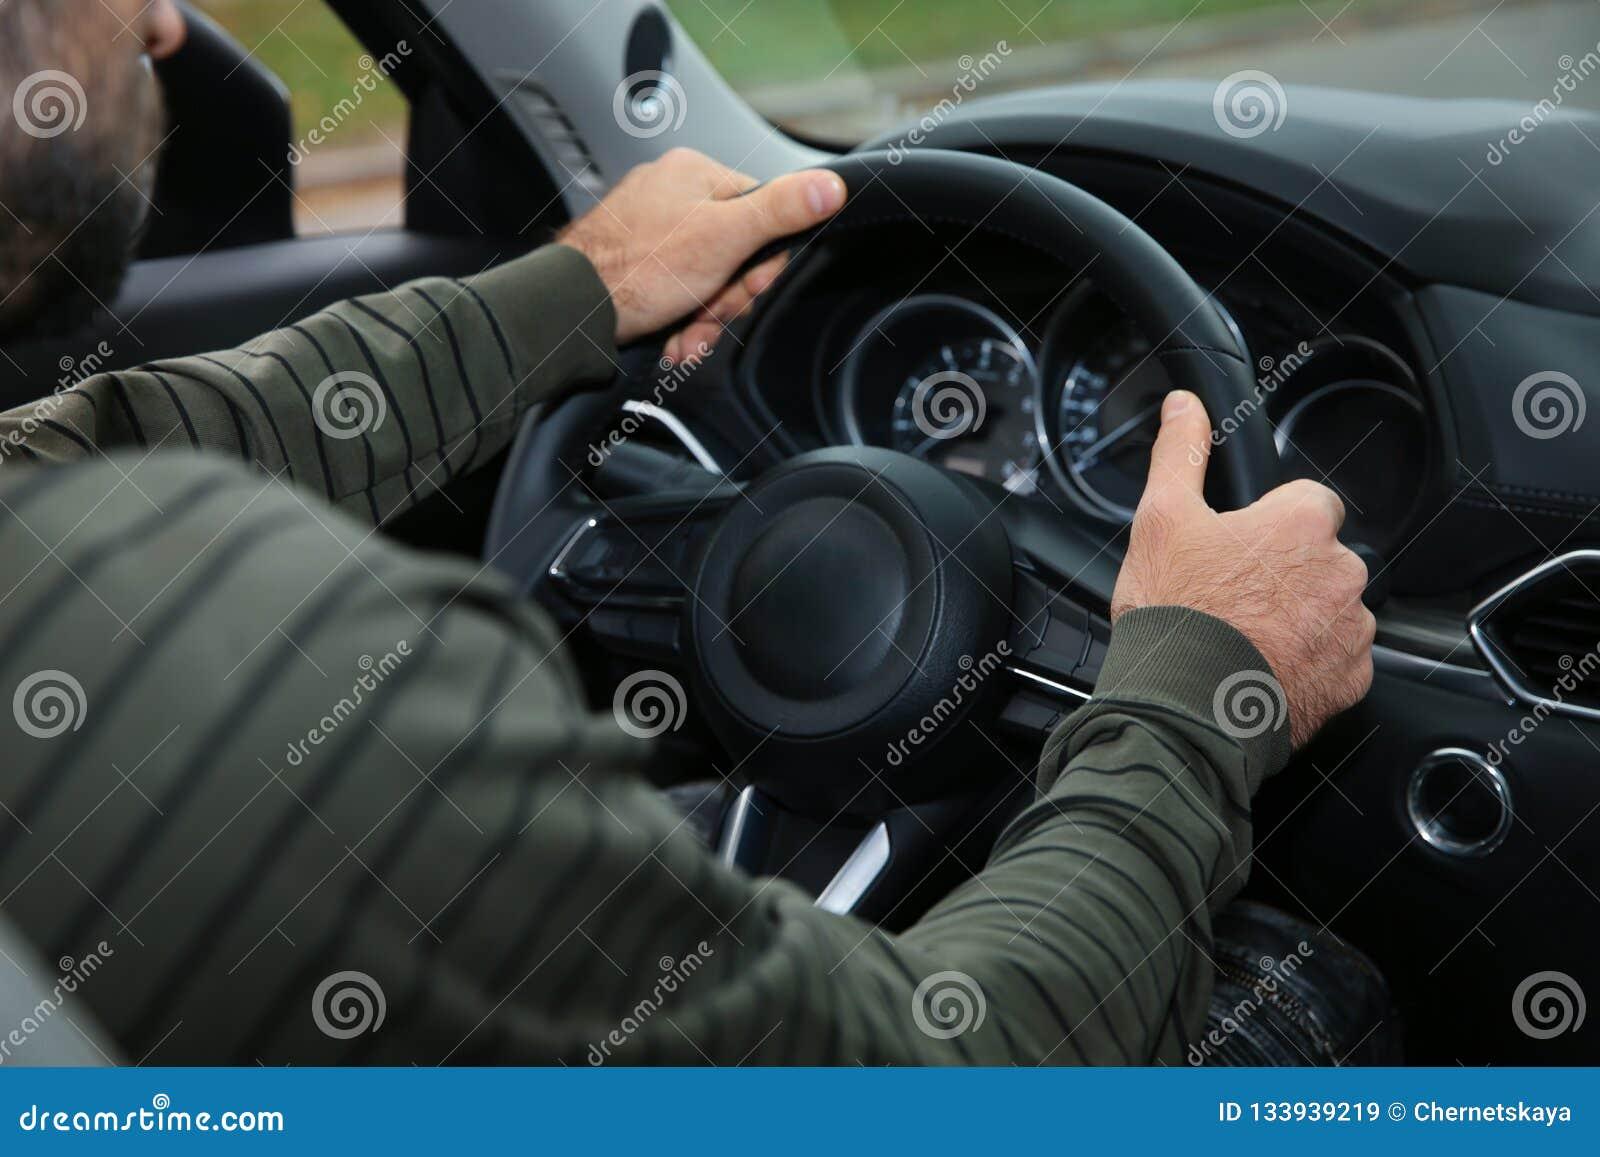 Man Holding Steering Wheel In Car, Closeup  Driving Test Stock Image